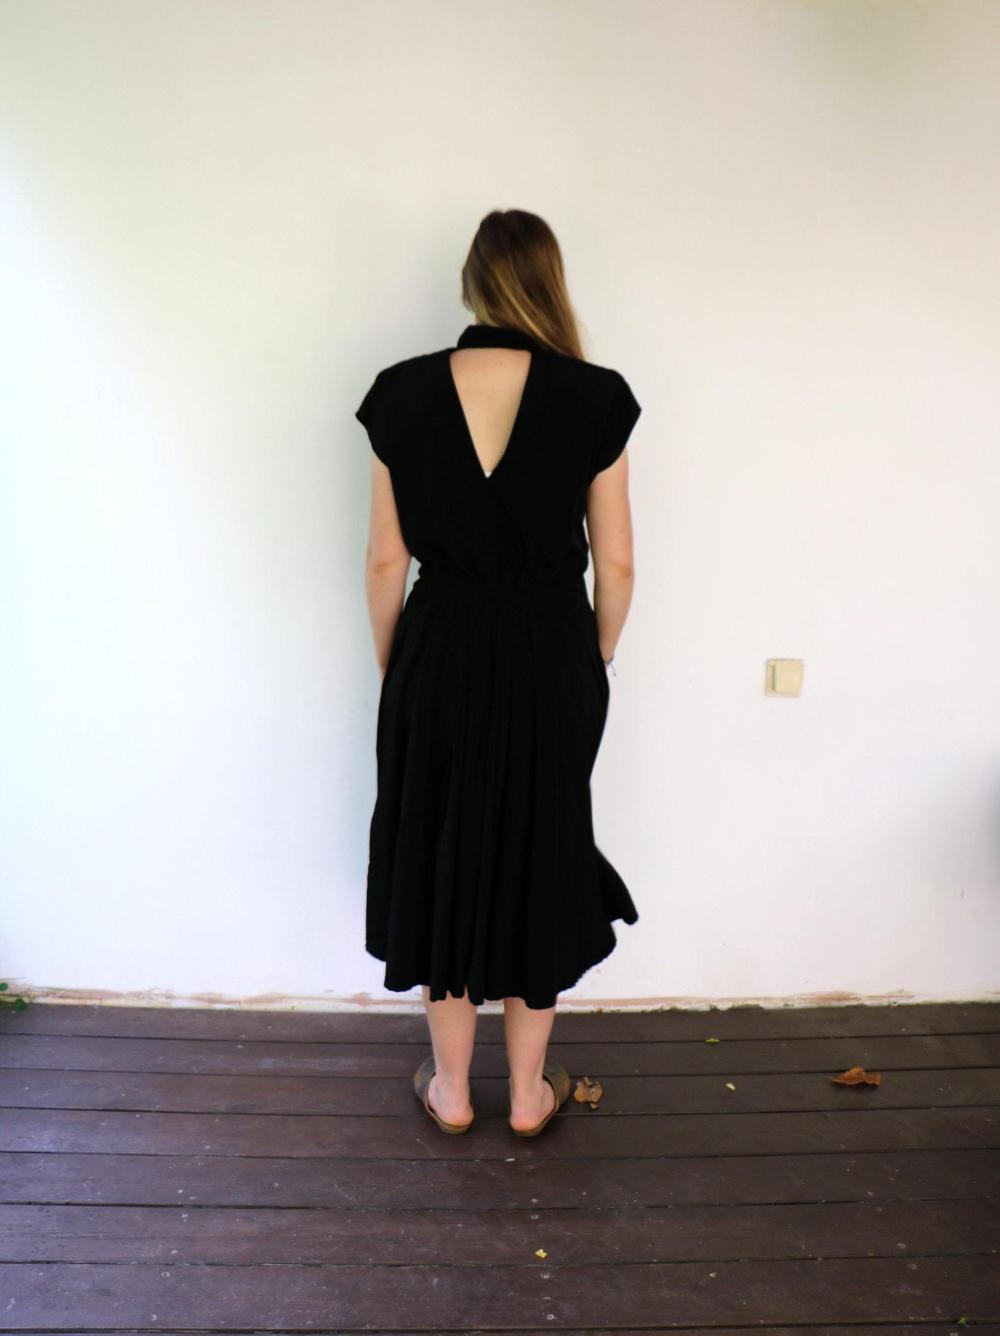 Vintage 80s 90s Black Dress Boho Hippie Cutout Back High Etsy Black Boho Dress Vintage Black Dress Boho Dress [ 1336 x 1000 Pixel ]